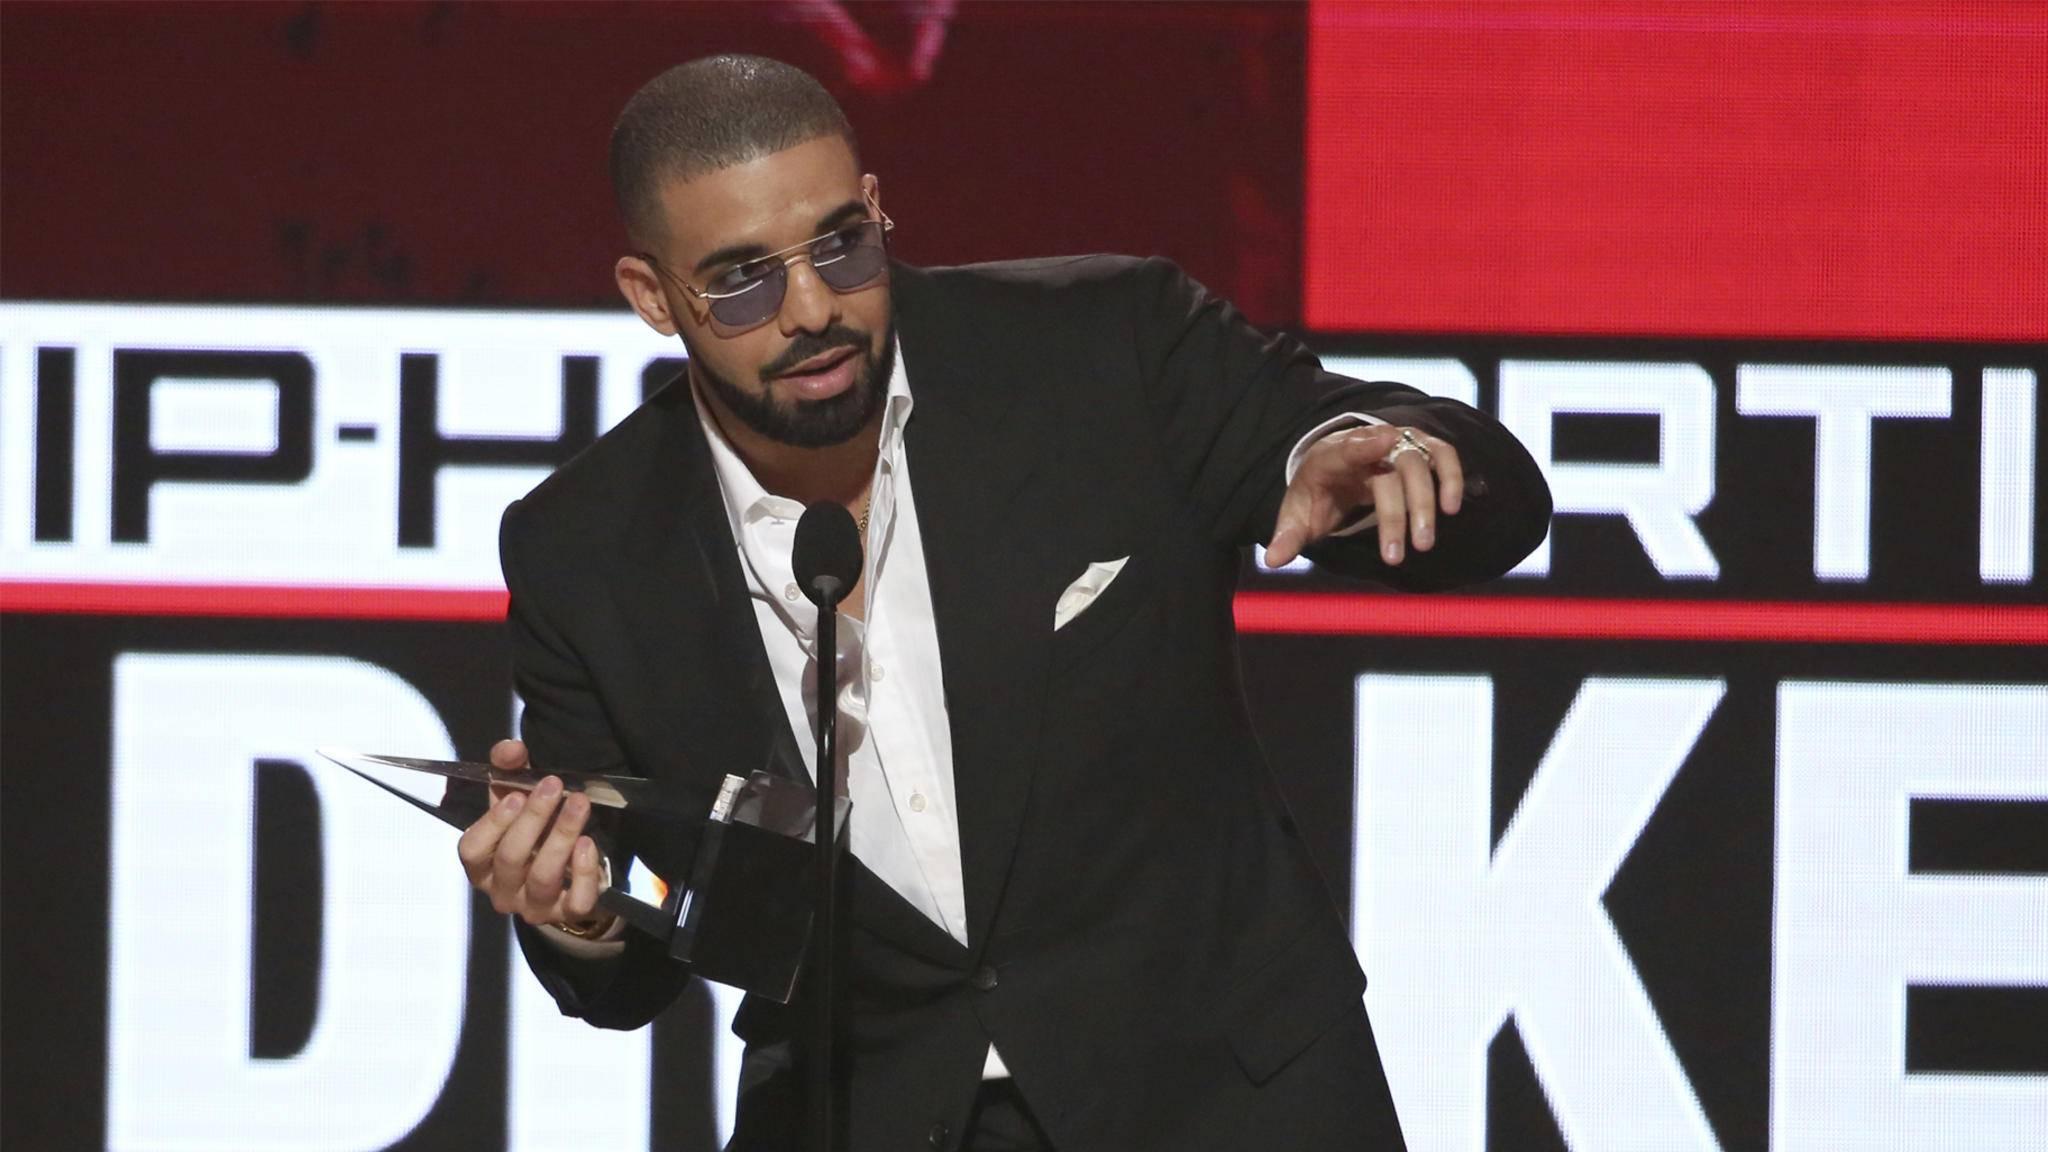 Drake nahm bei den AMAs 2016 drei Solo-Preise entgegen.